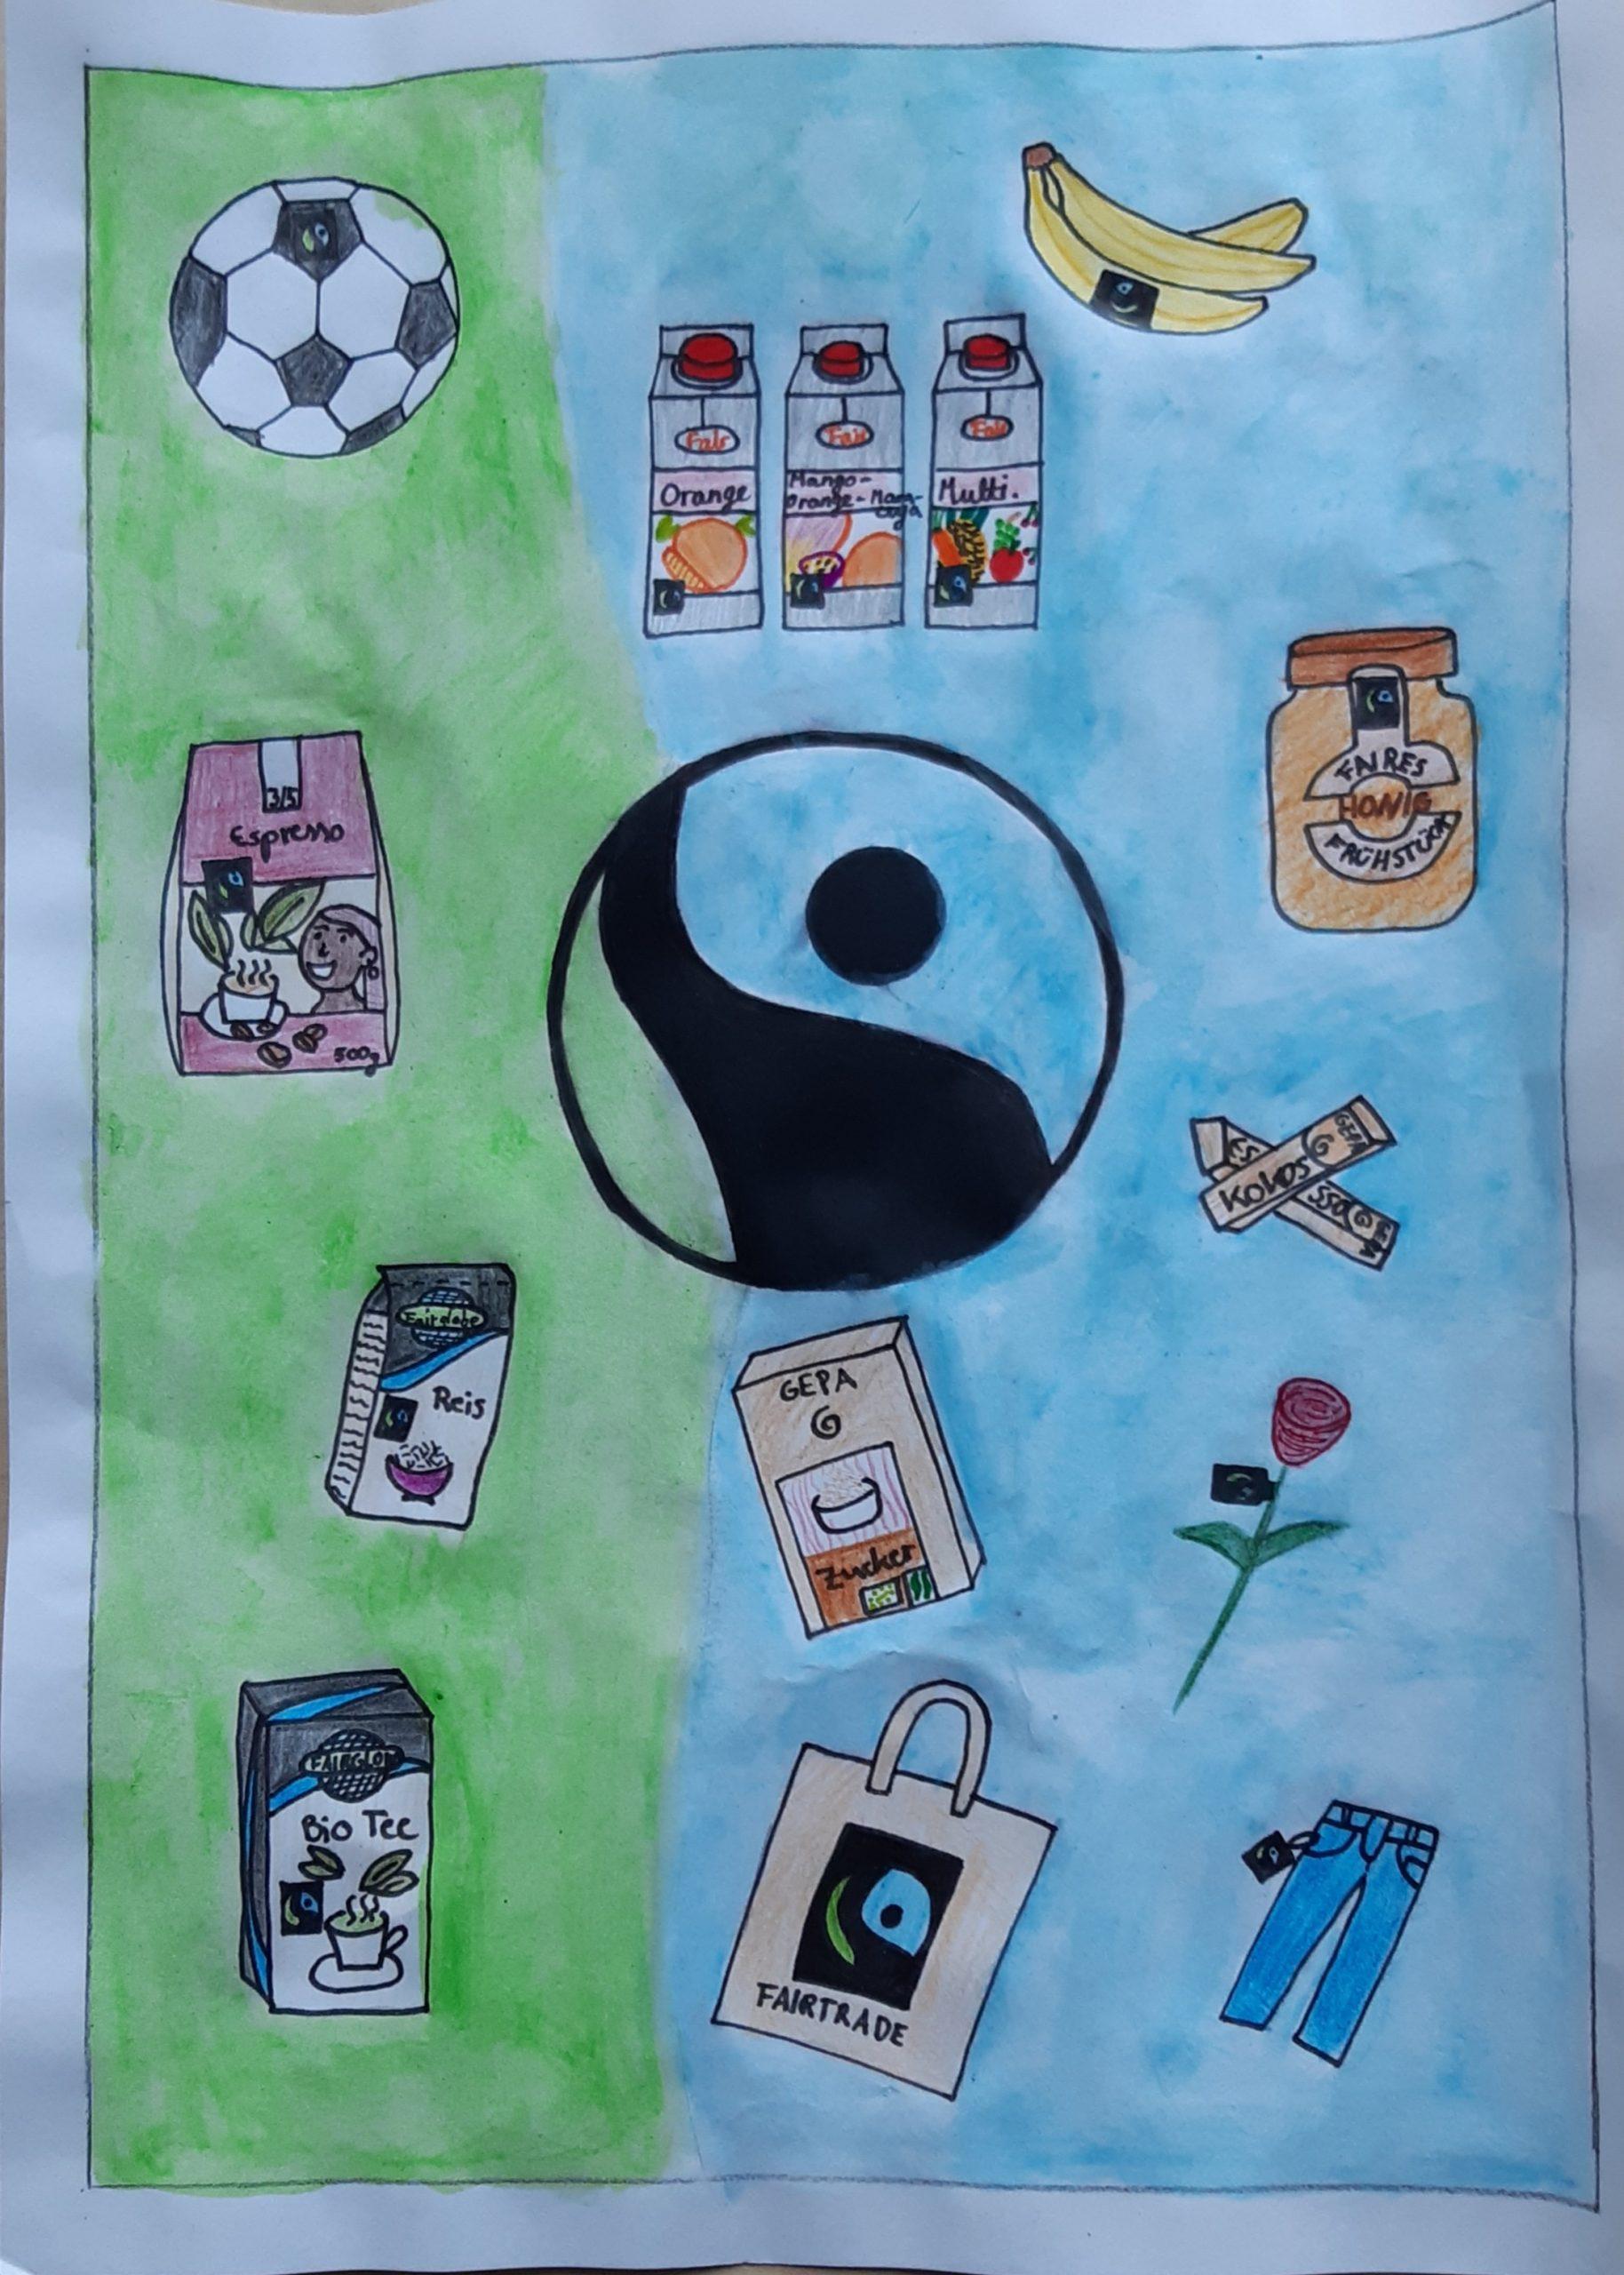 jugendkulturjahr-2020-ratingen-jkj2020-malwettbewerb-cover-fair-trade